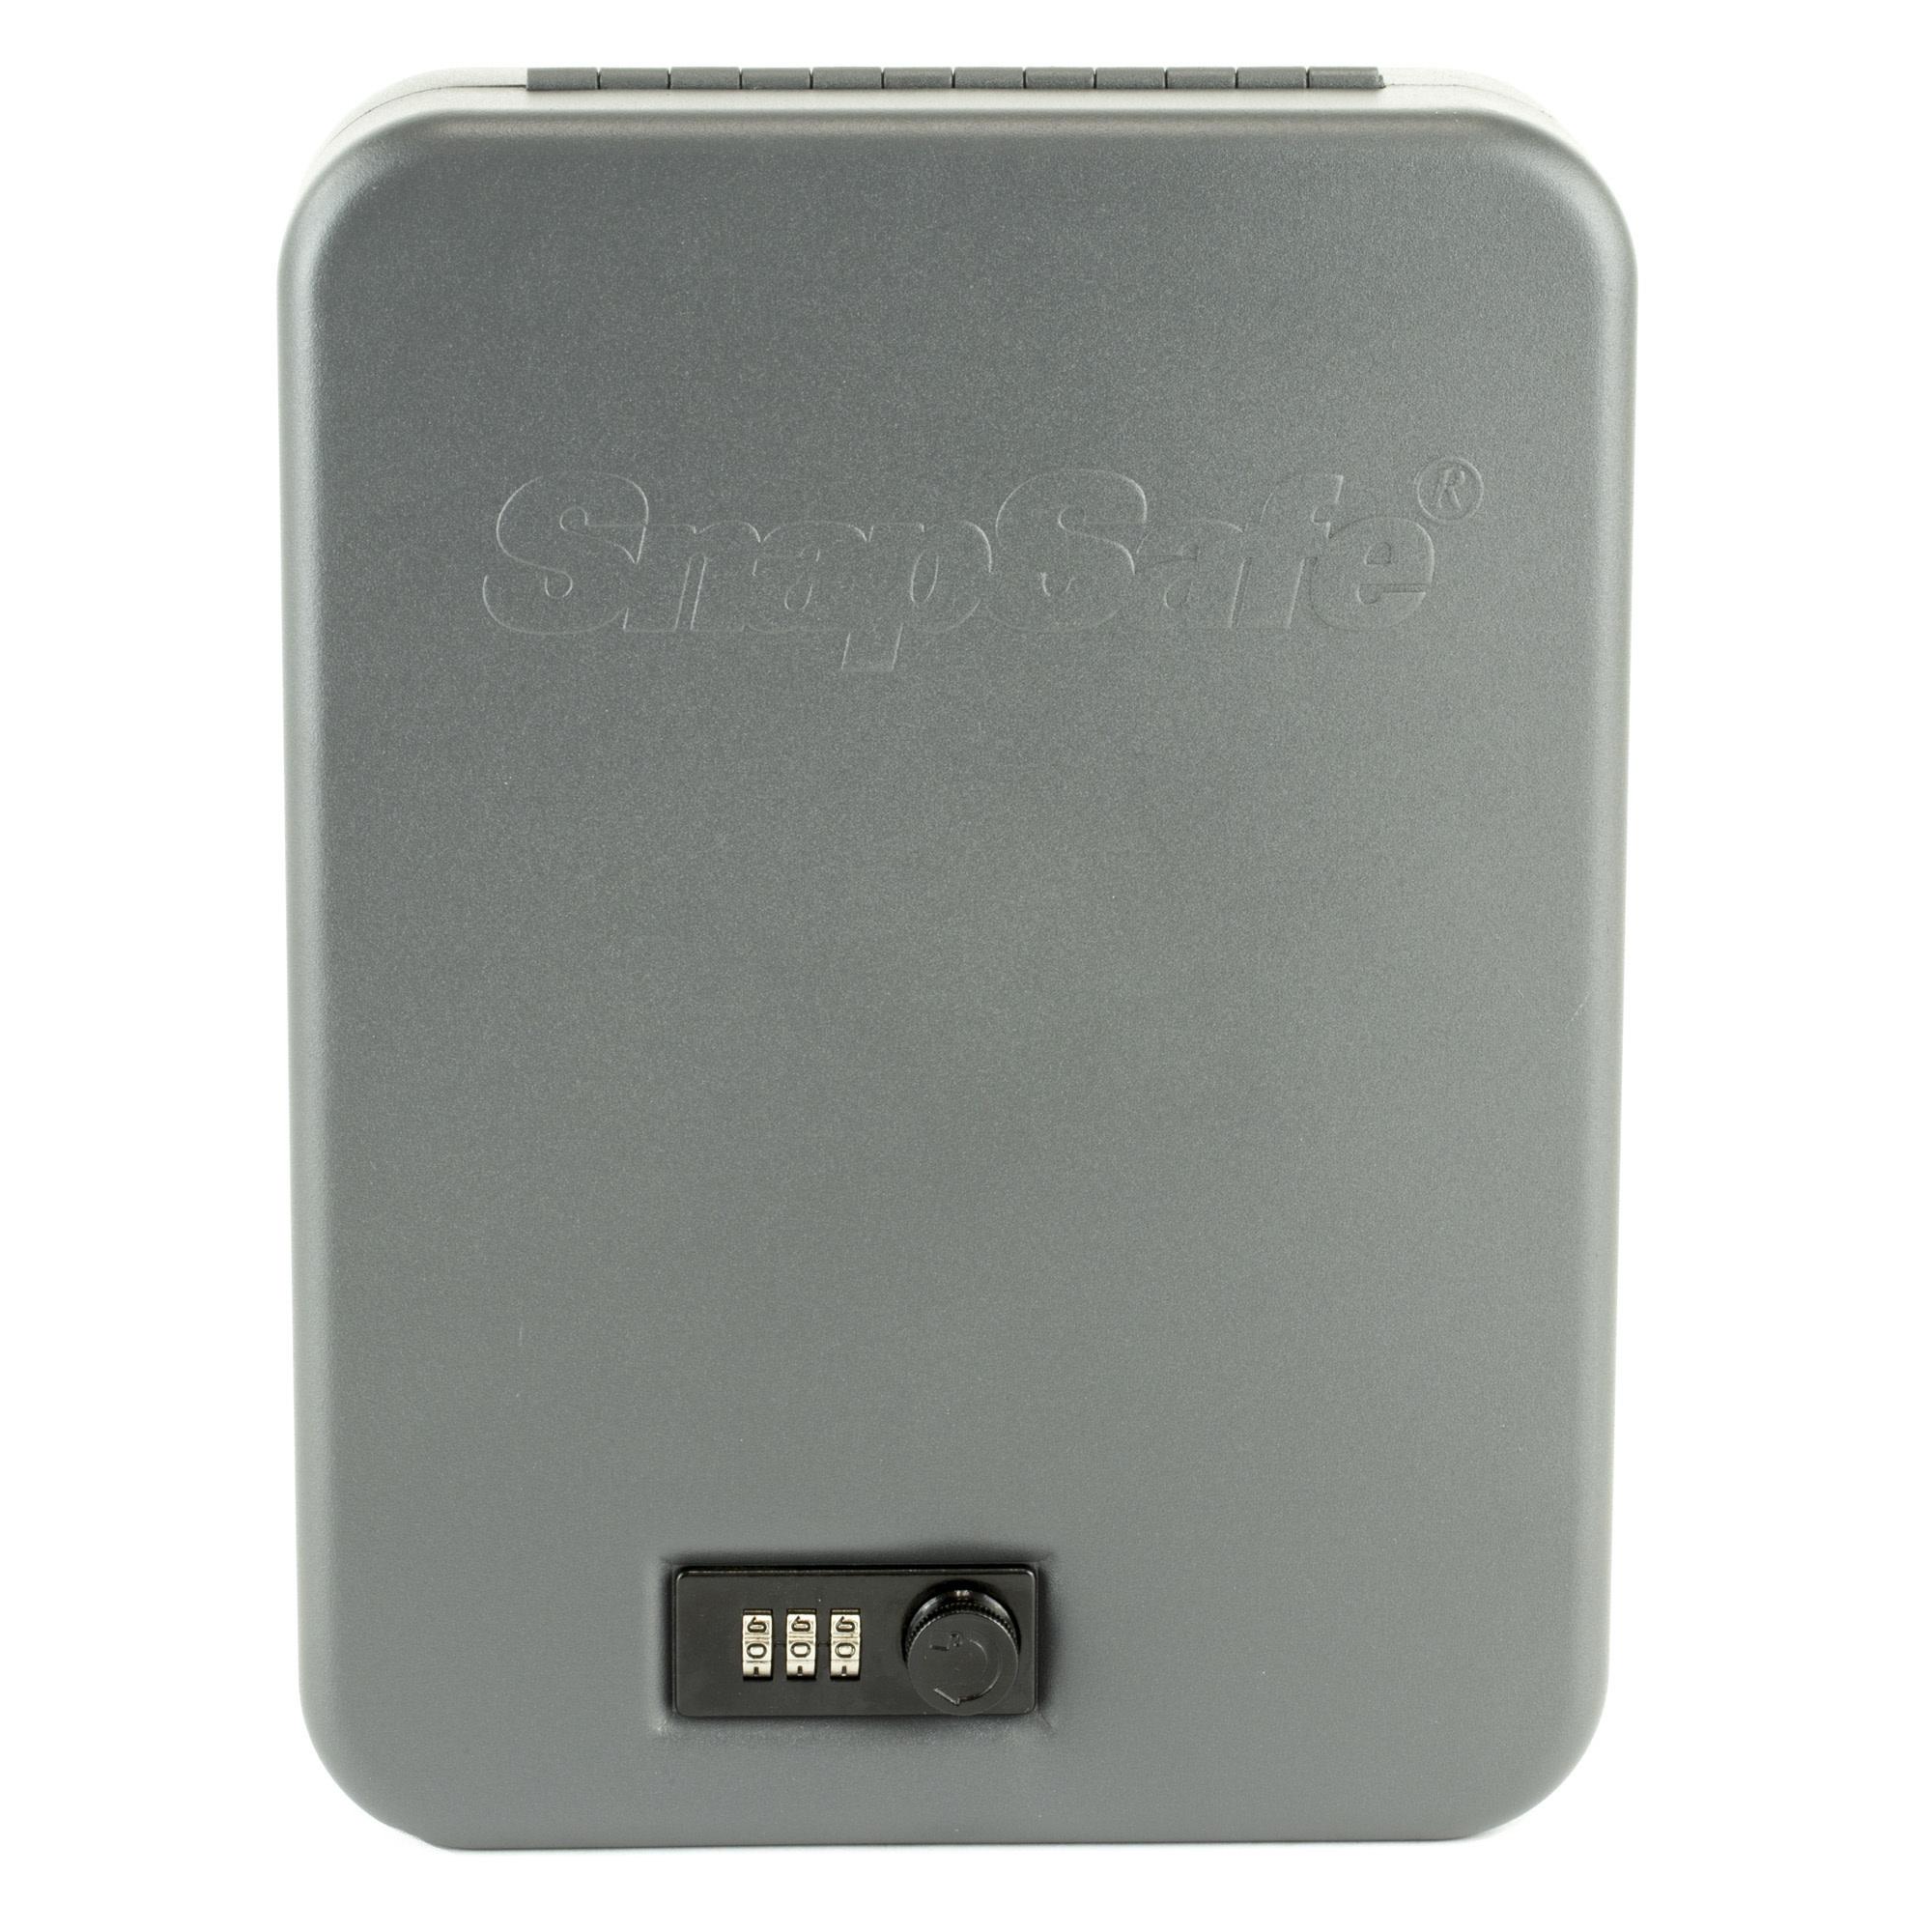 "Snap Safe SnapSafe XX-Large 11.5"" x 8.5"" x 2.5"" Combination Lock 16 Gauge Black Finish"